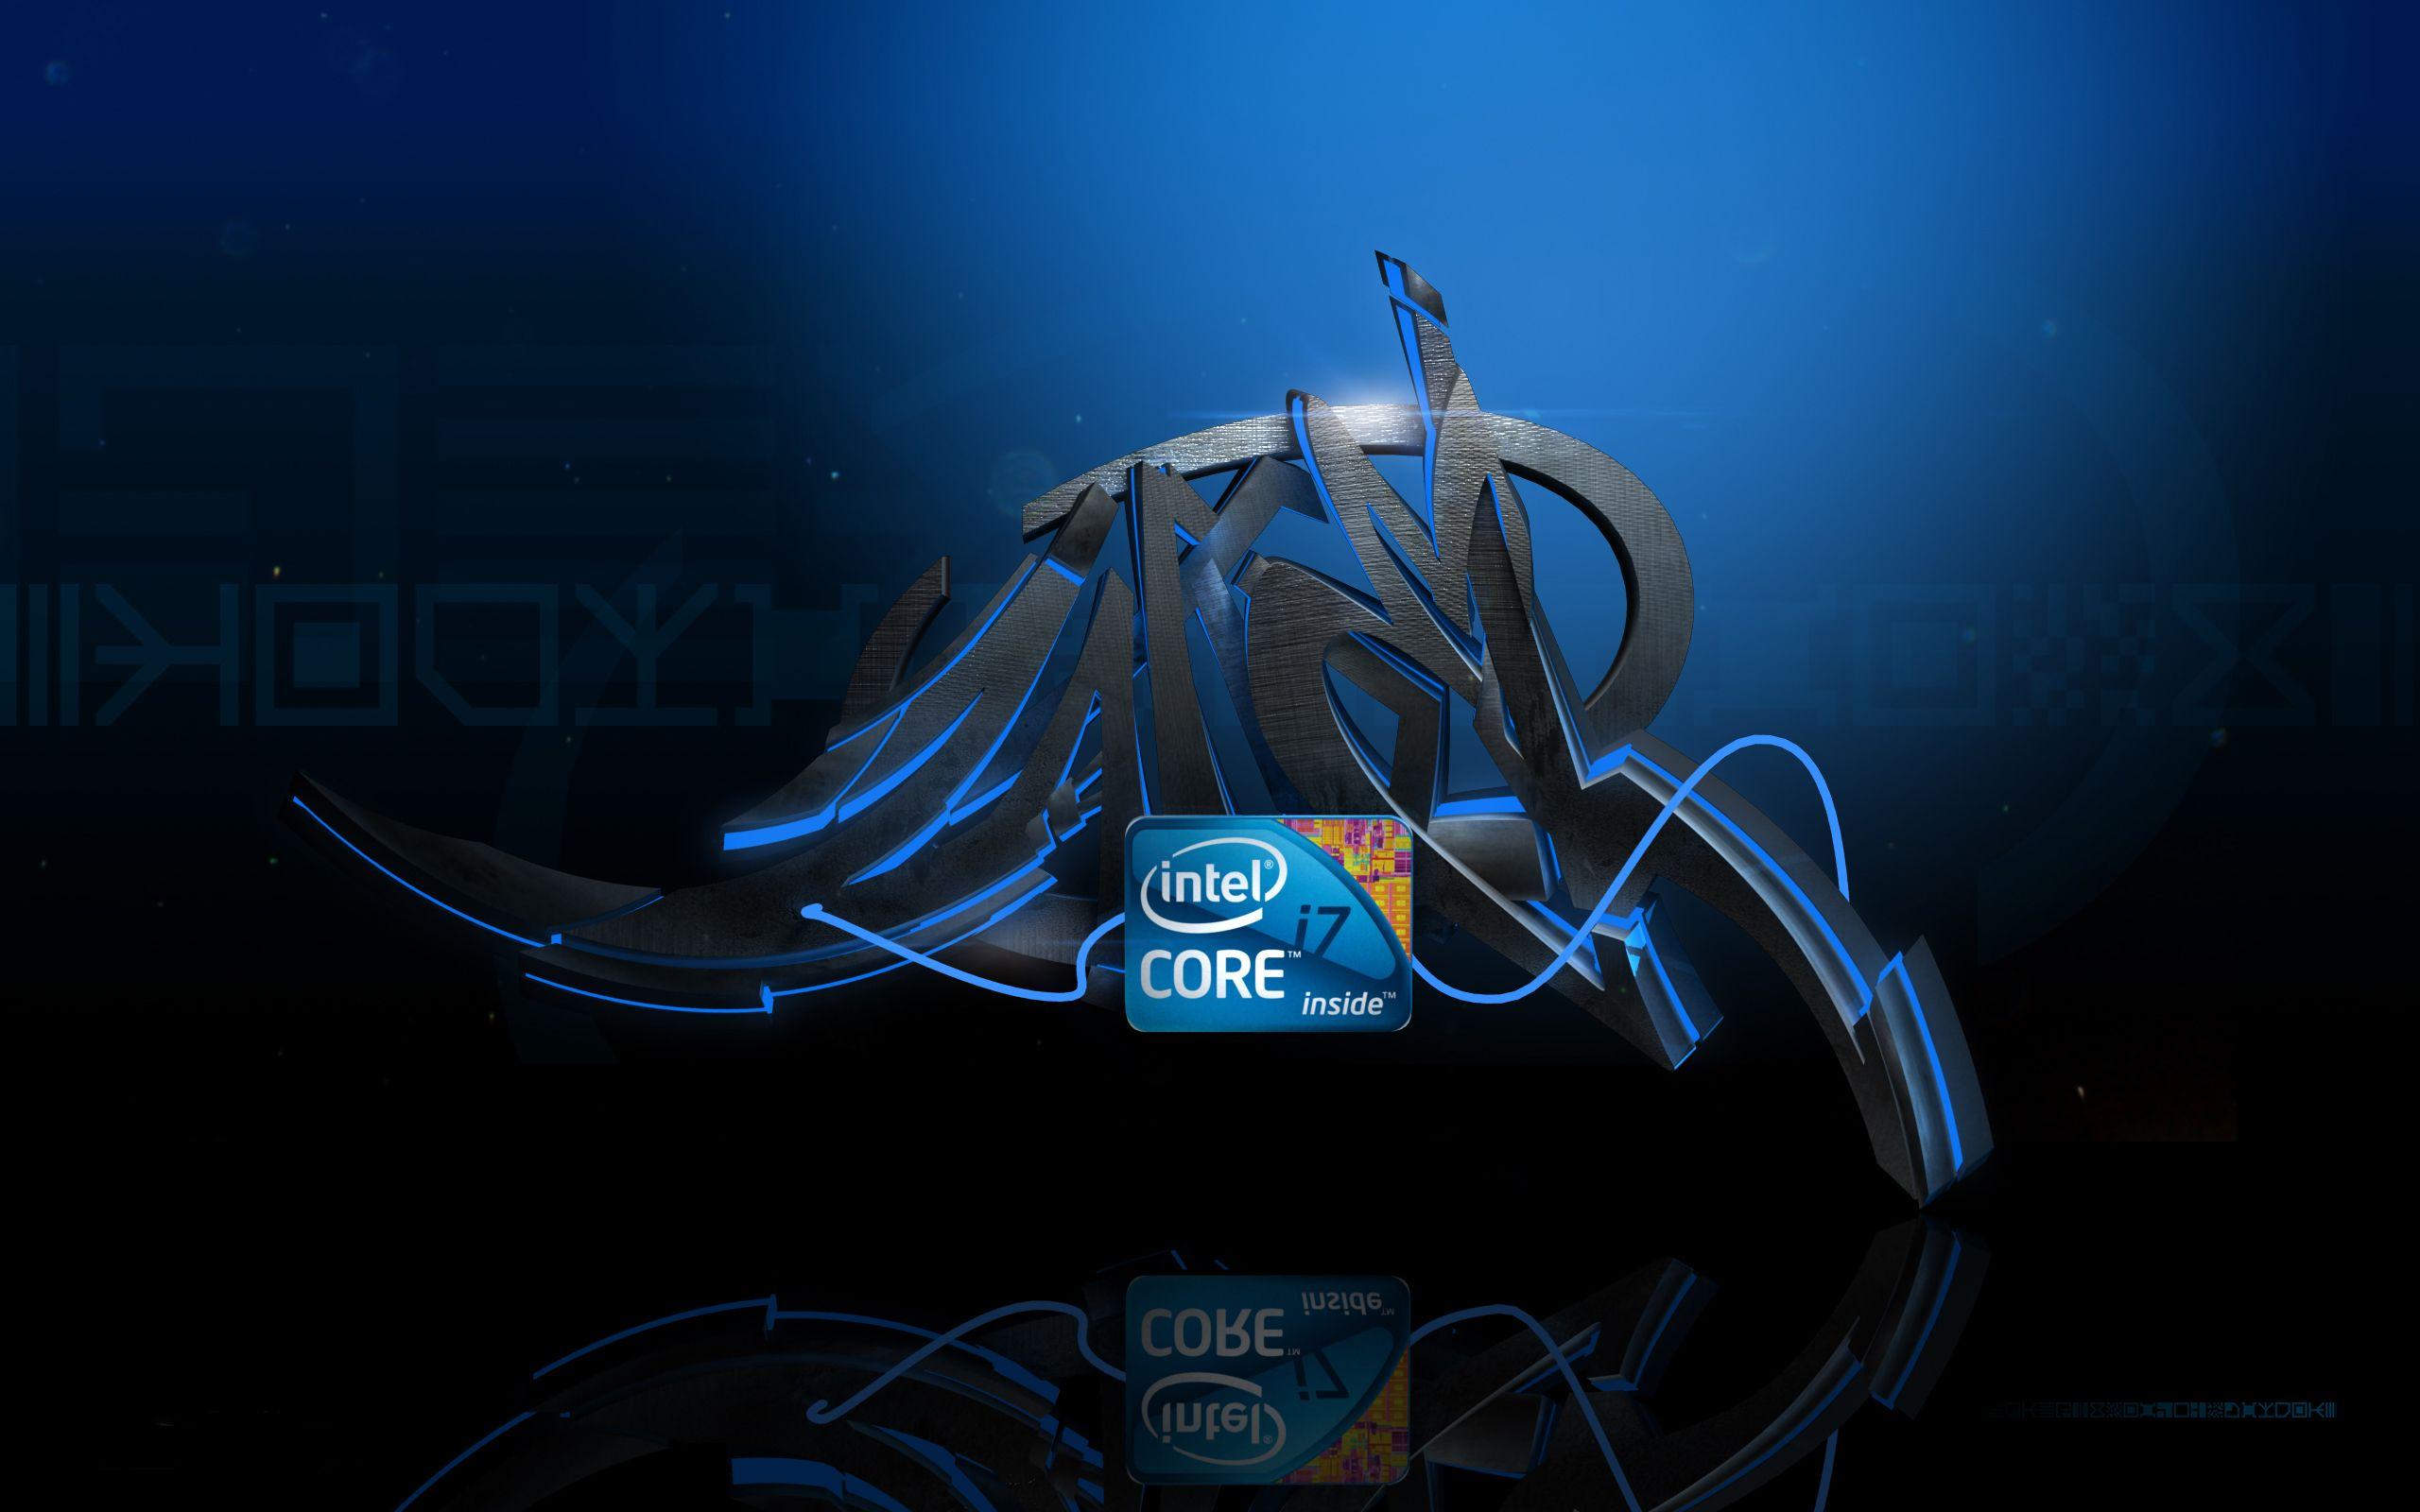 Intel I7 Technology Graffiti Wallpaper Computer